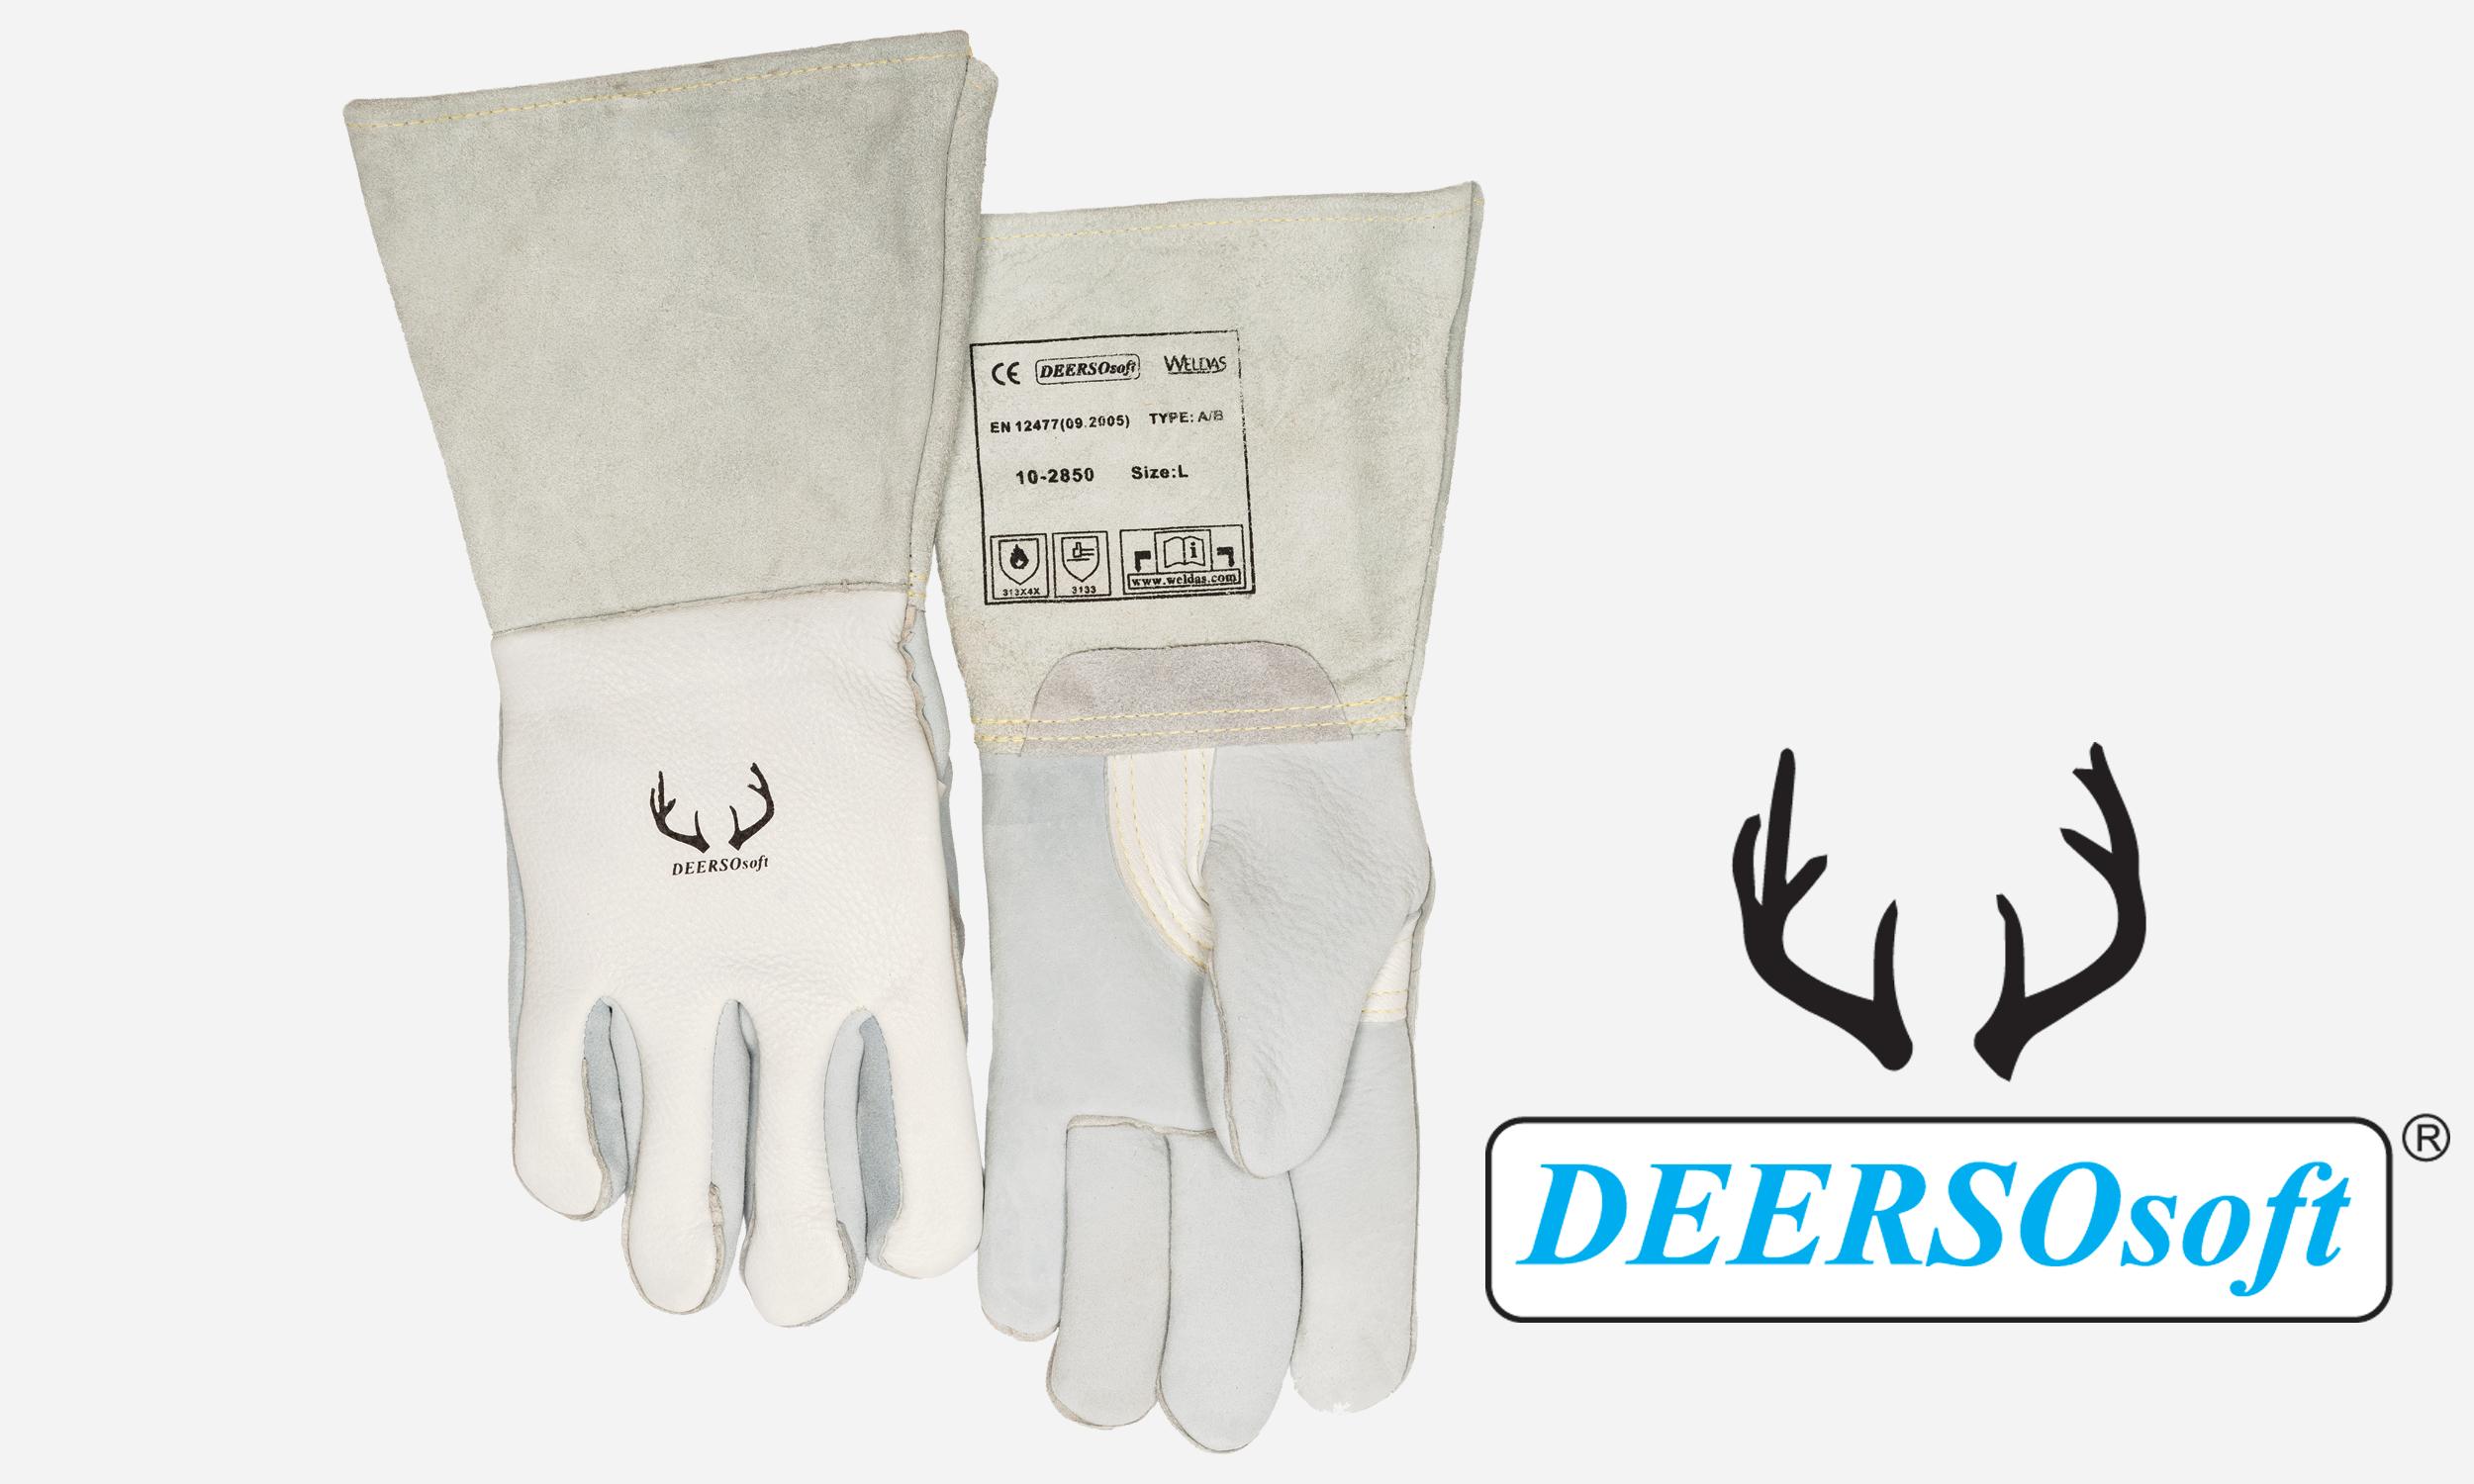 White Deerskin Welding Glove